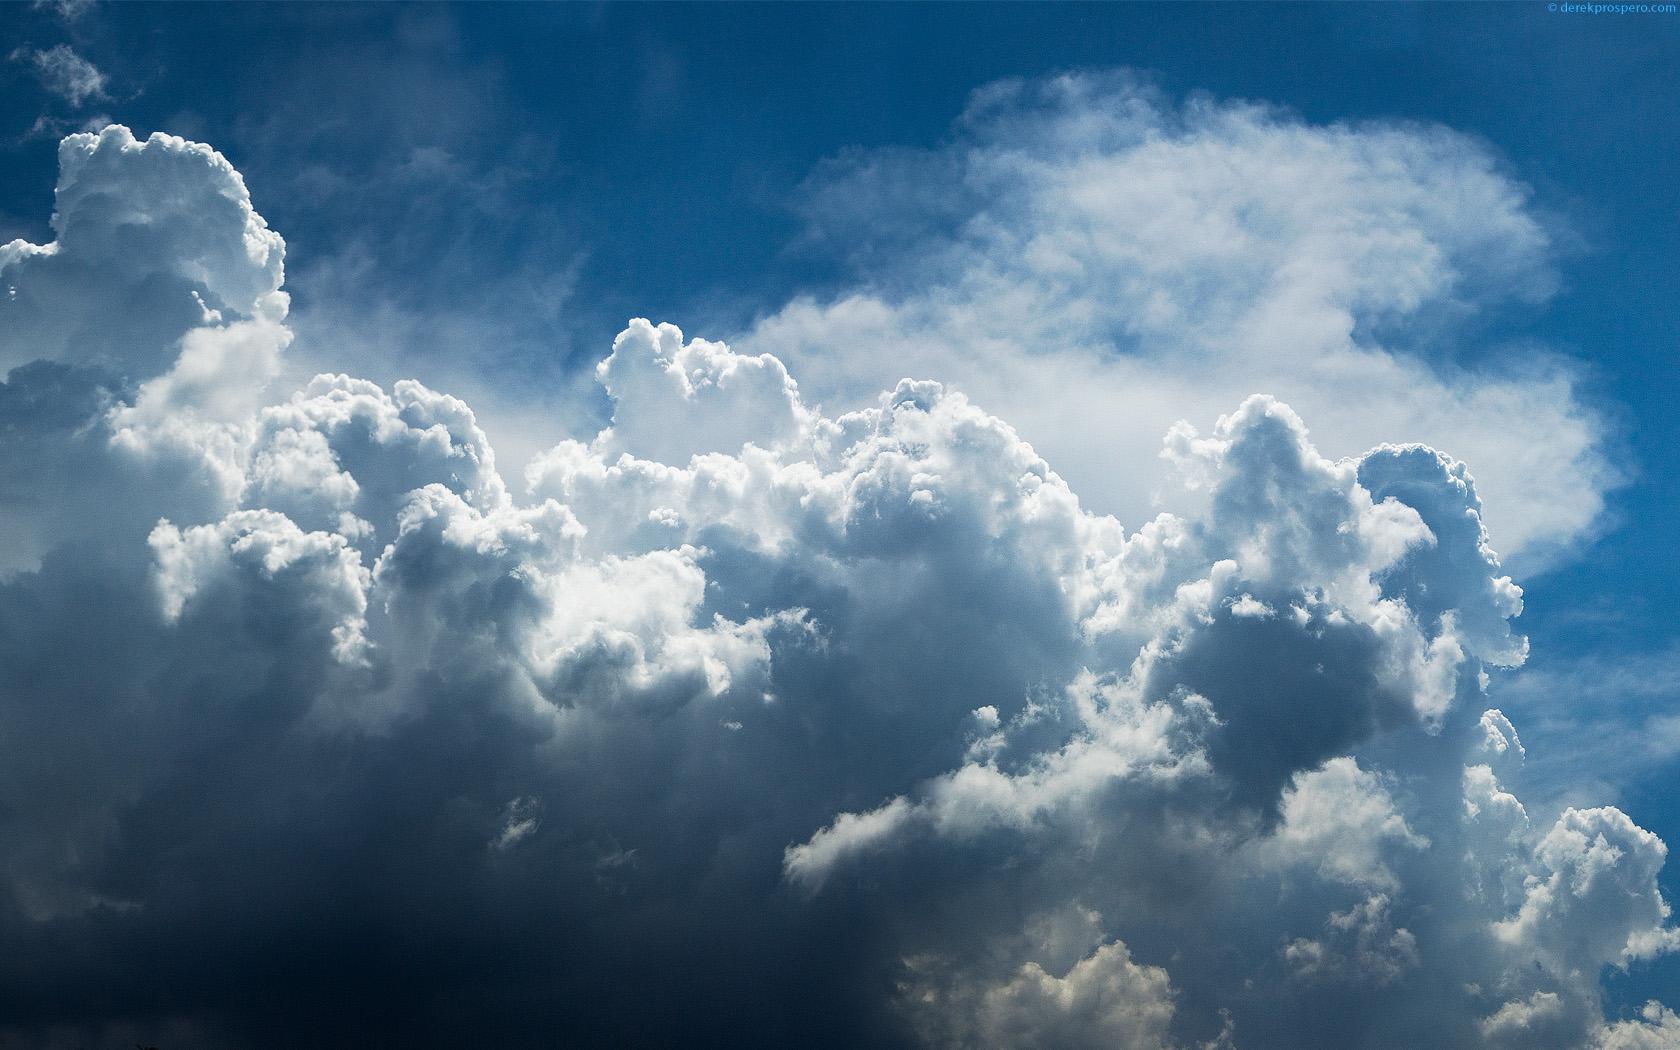 fondos nubes adnfriki (6)